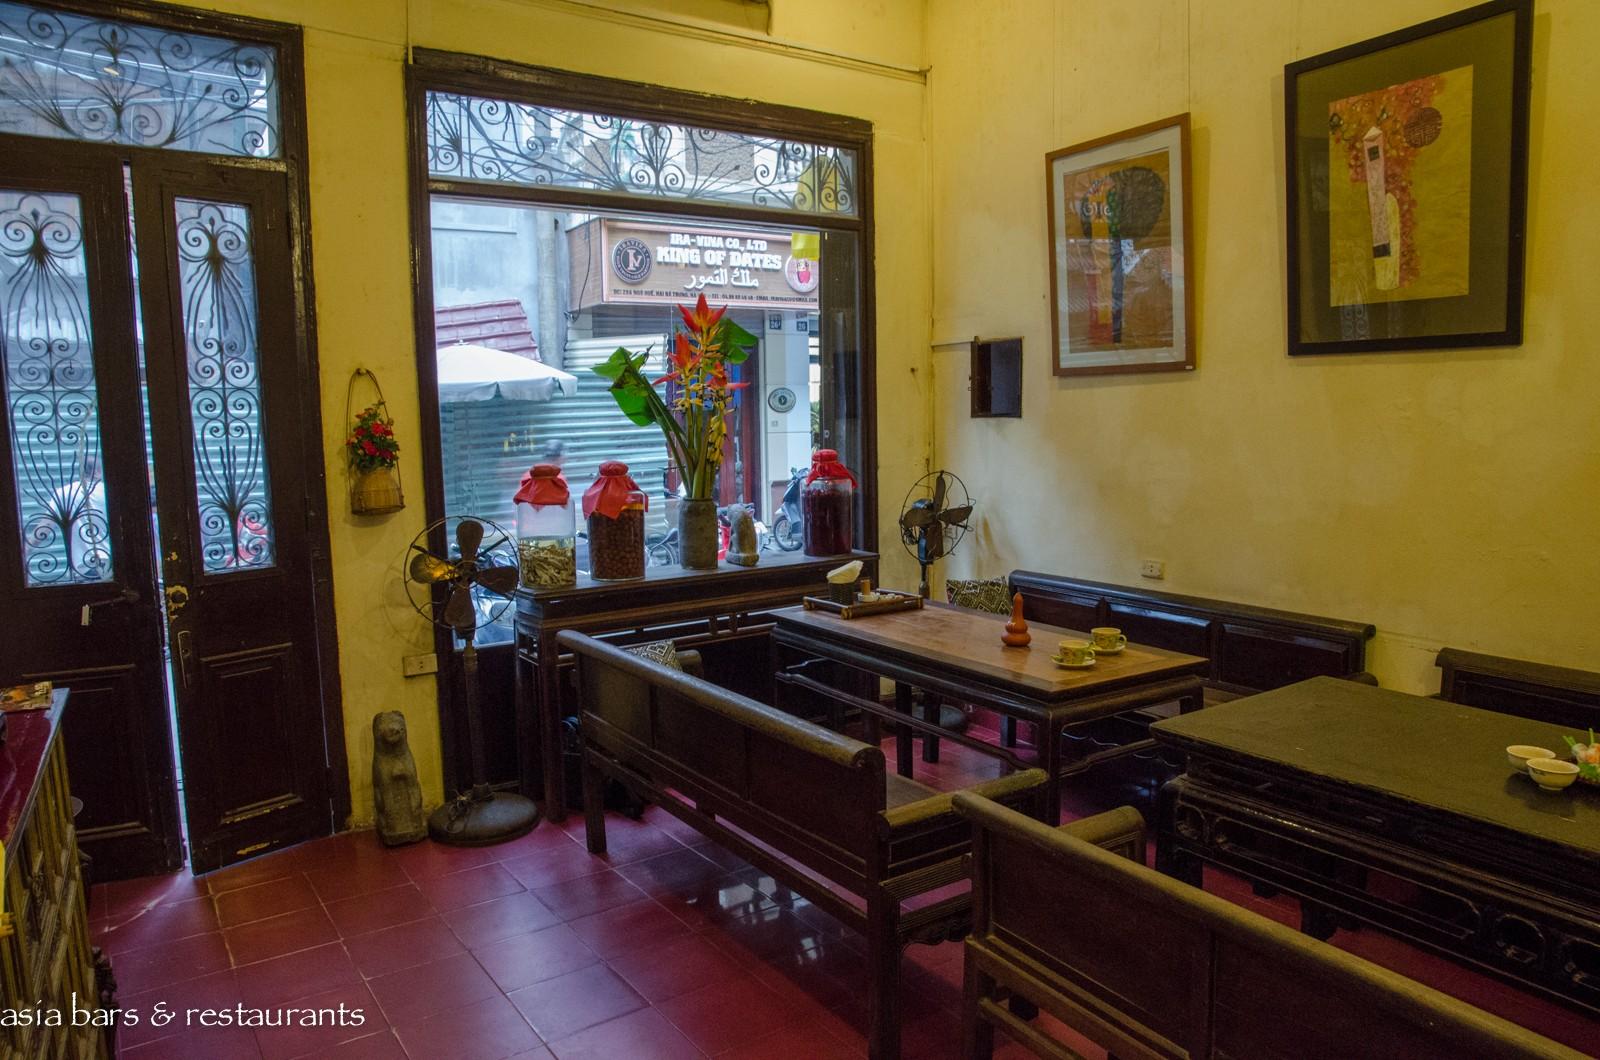 Chim sao traditional vietnamese restaurant in hanoi - Authentic vietnamese cuisine ...